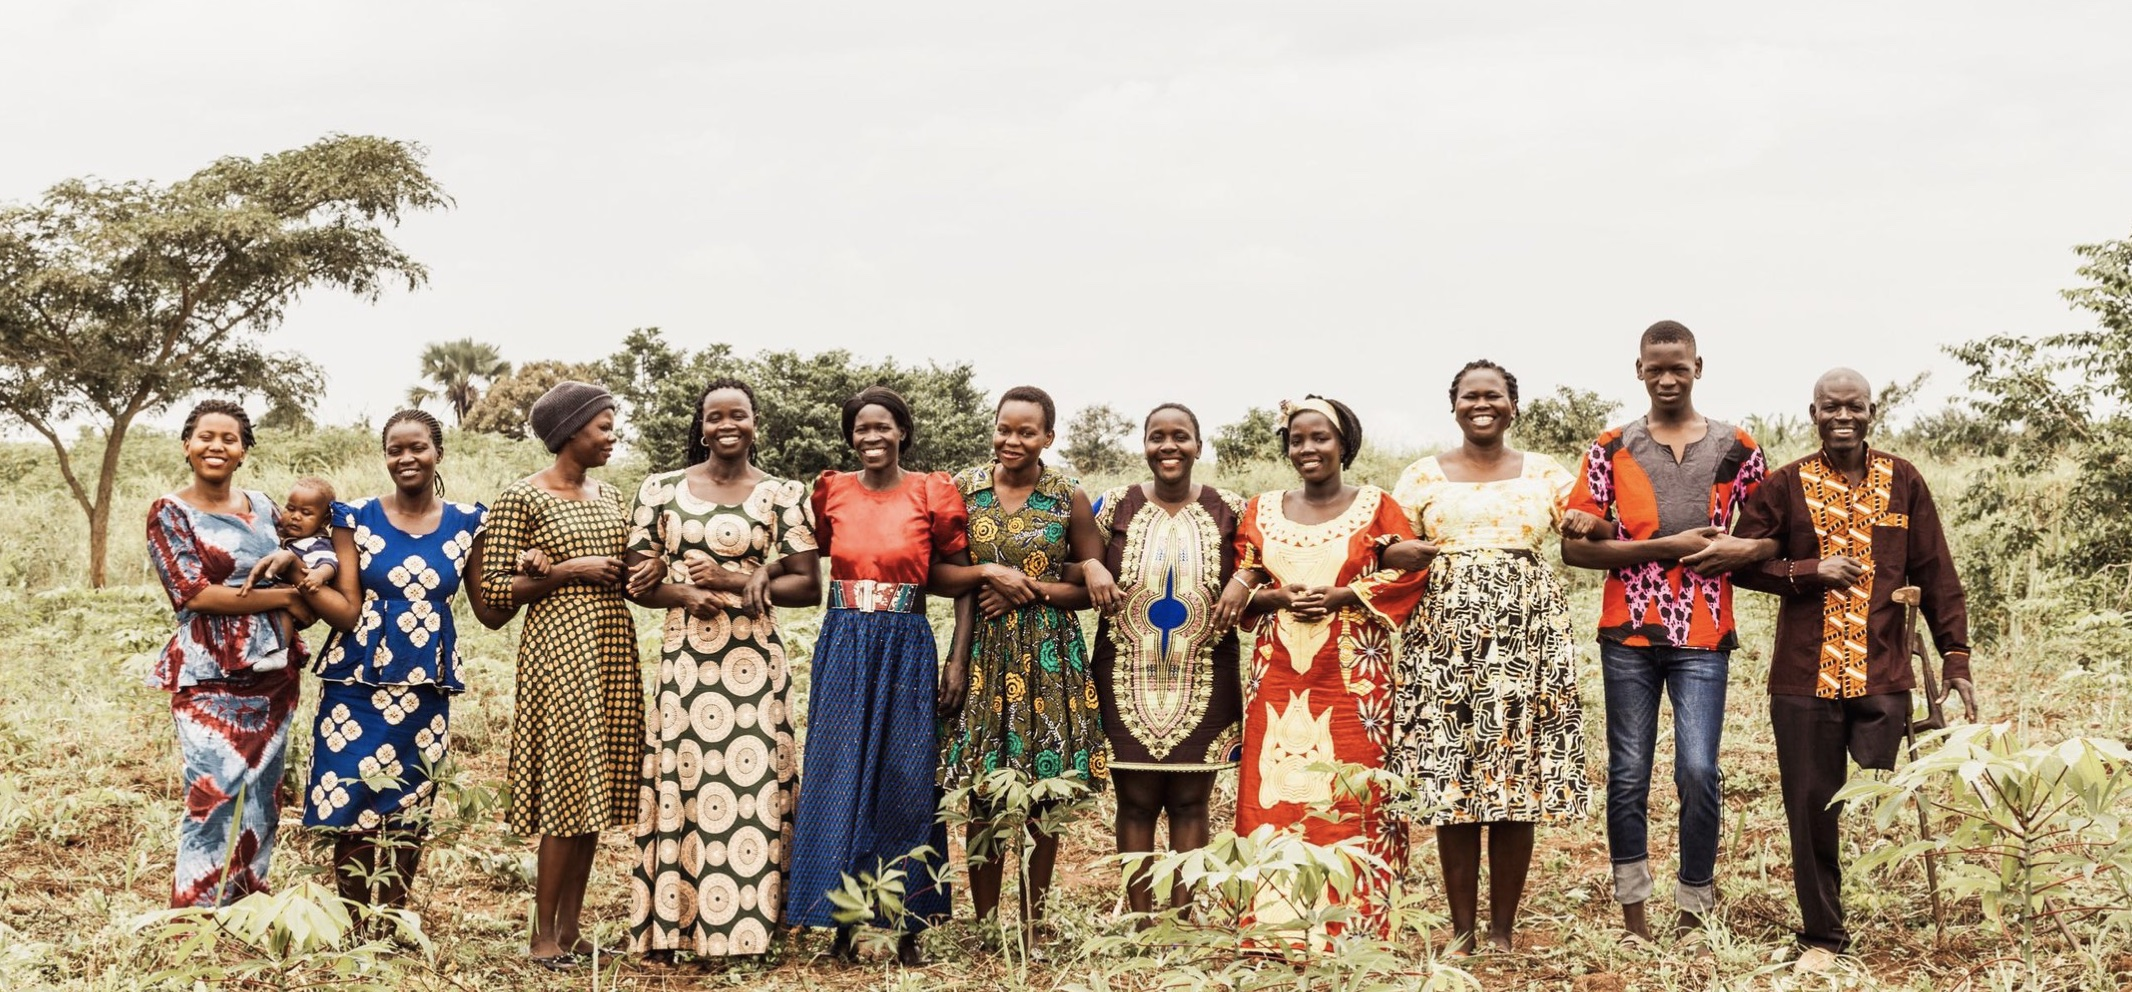 Artisan Global entrepreneurs, artisans, designers in Uganda